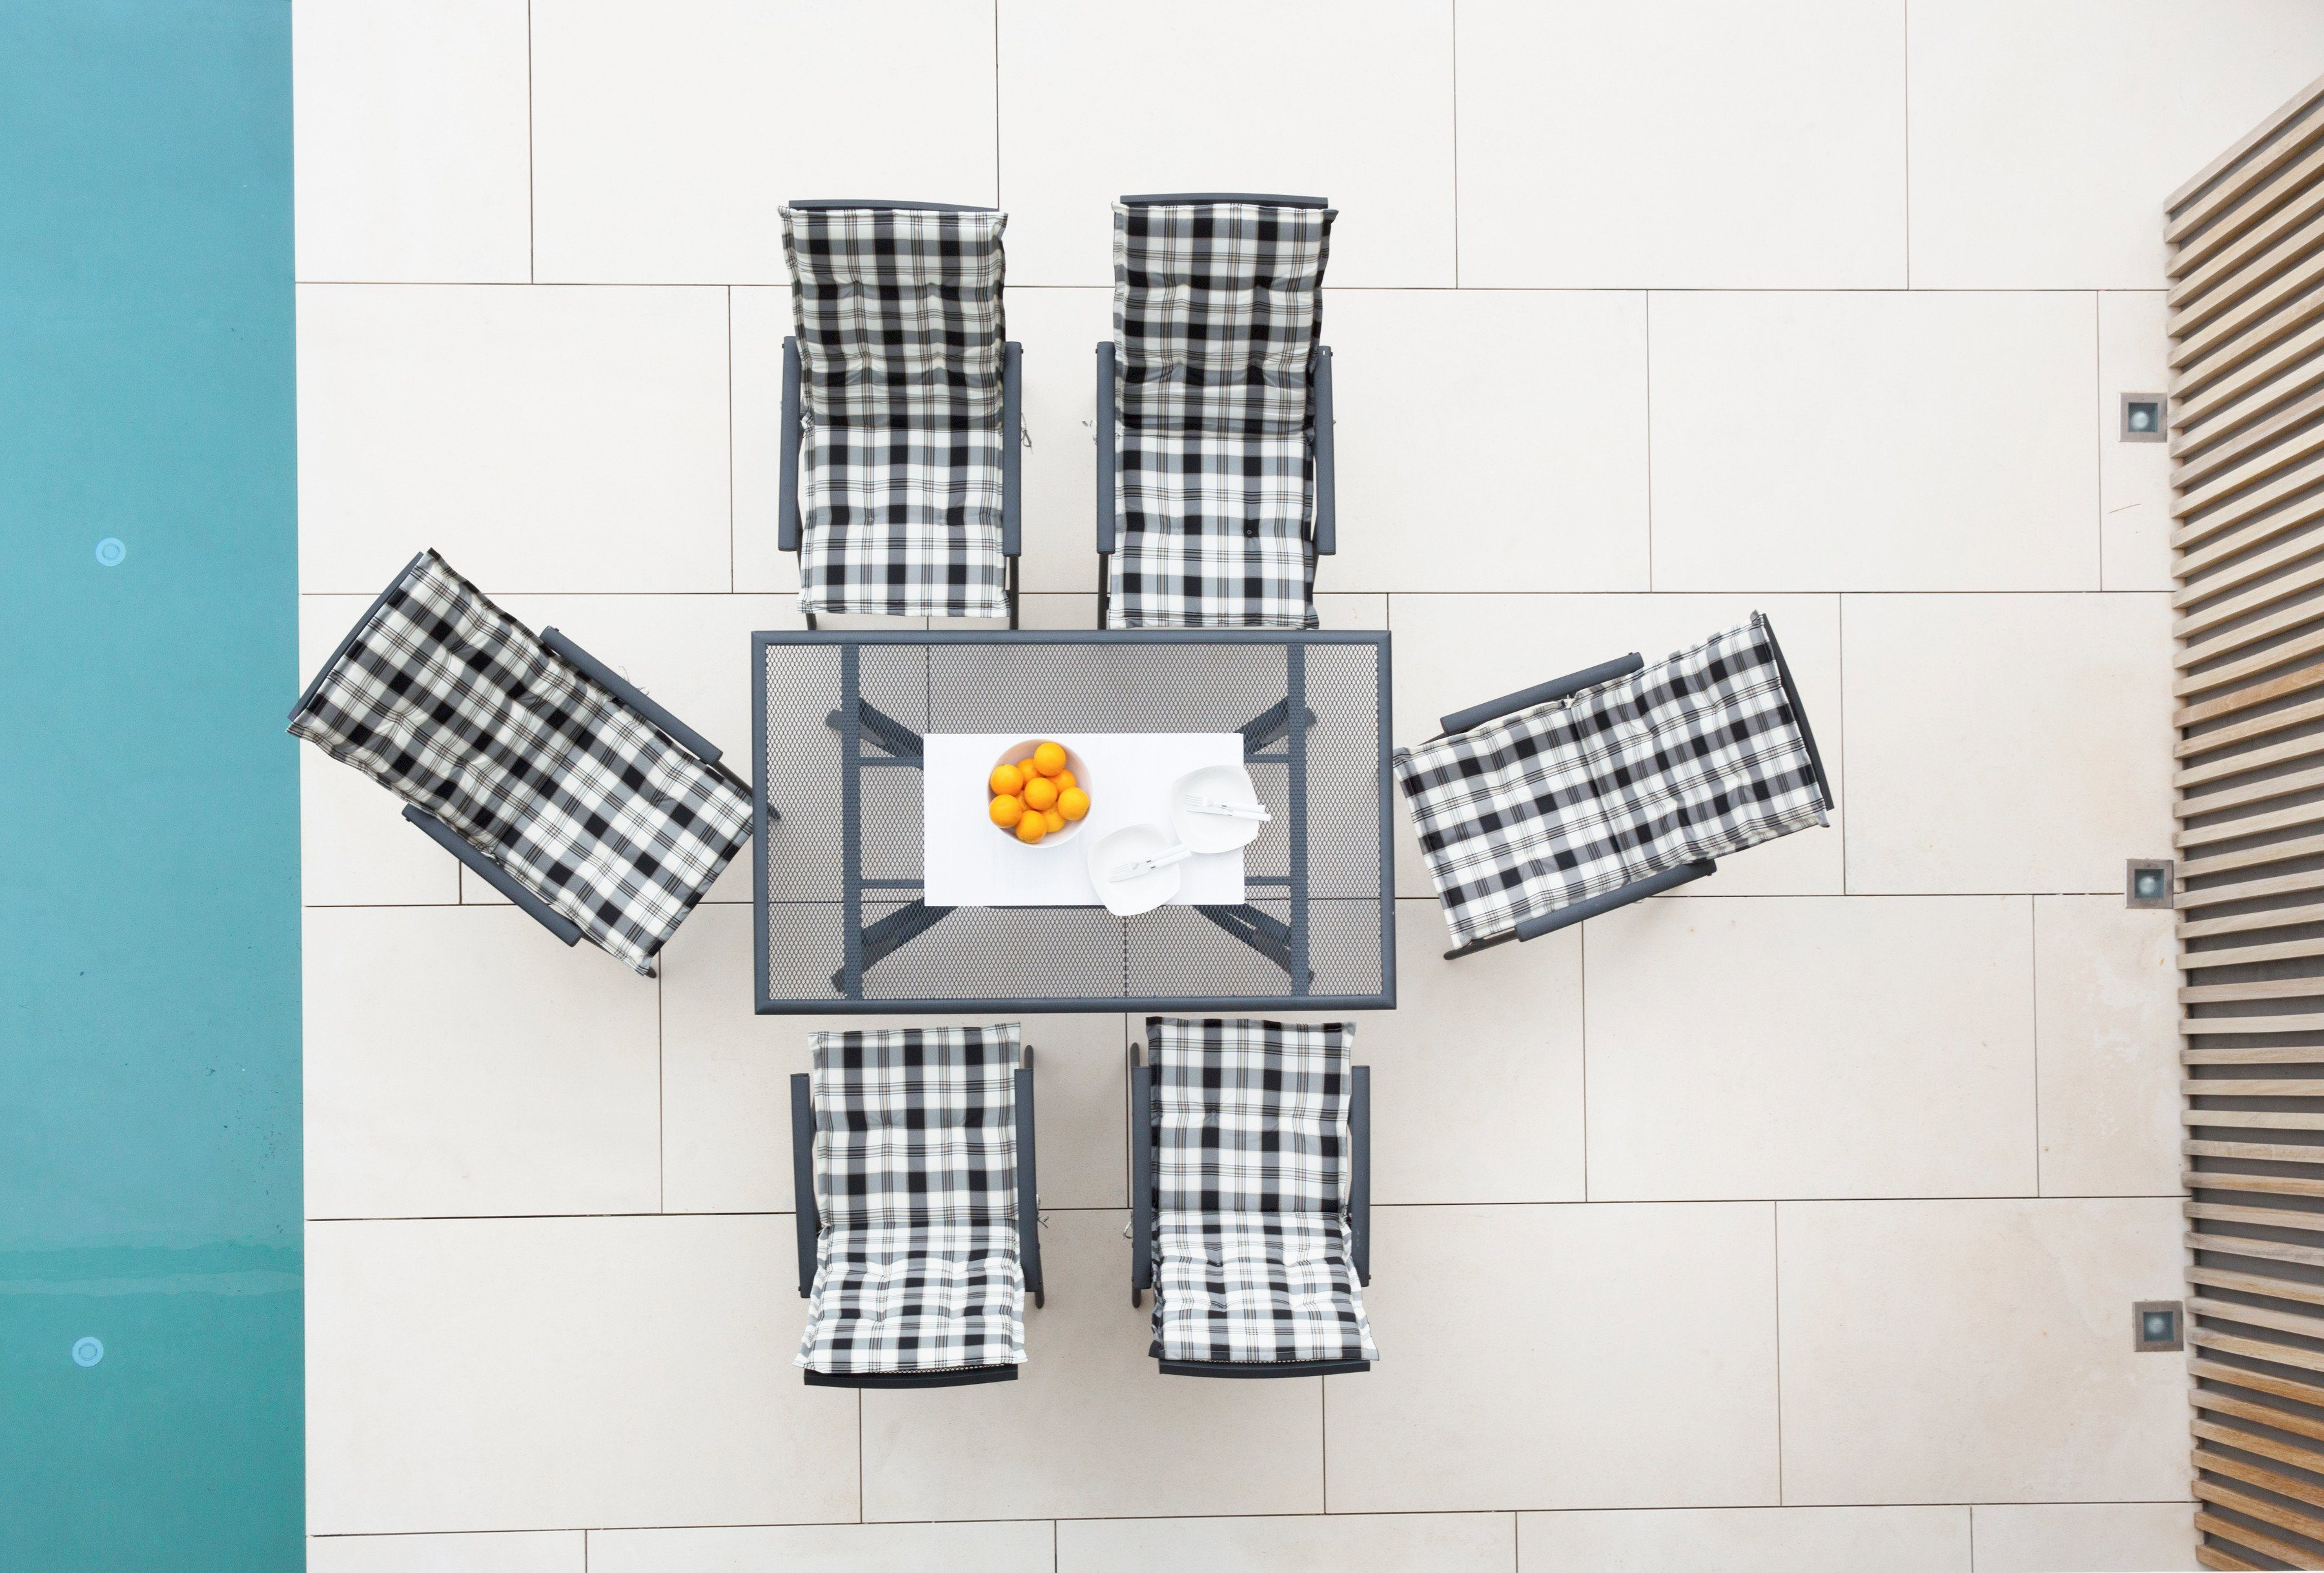 13-tgl. Gartenmöbelset »Montreal«, 6 Klappsessel, Tisch 150x90 cm, Alu, anthrazit